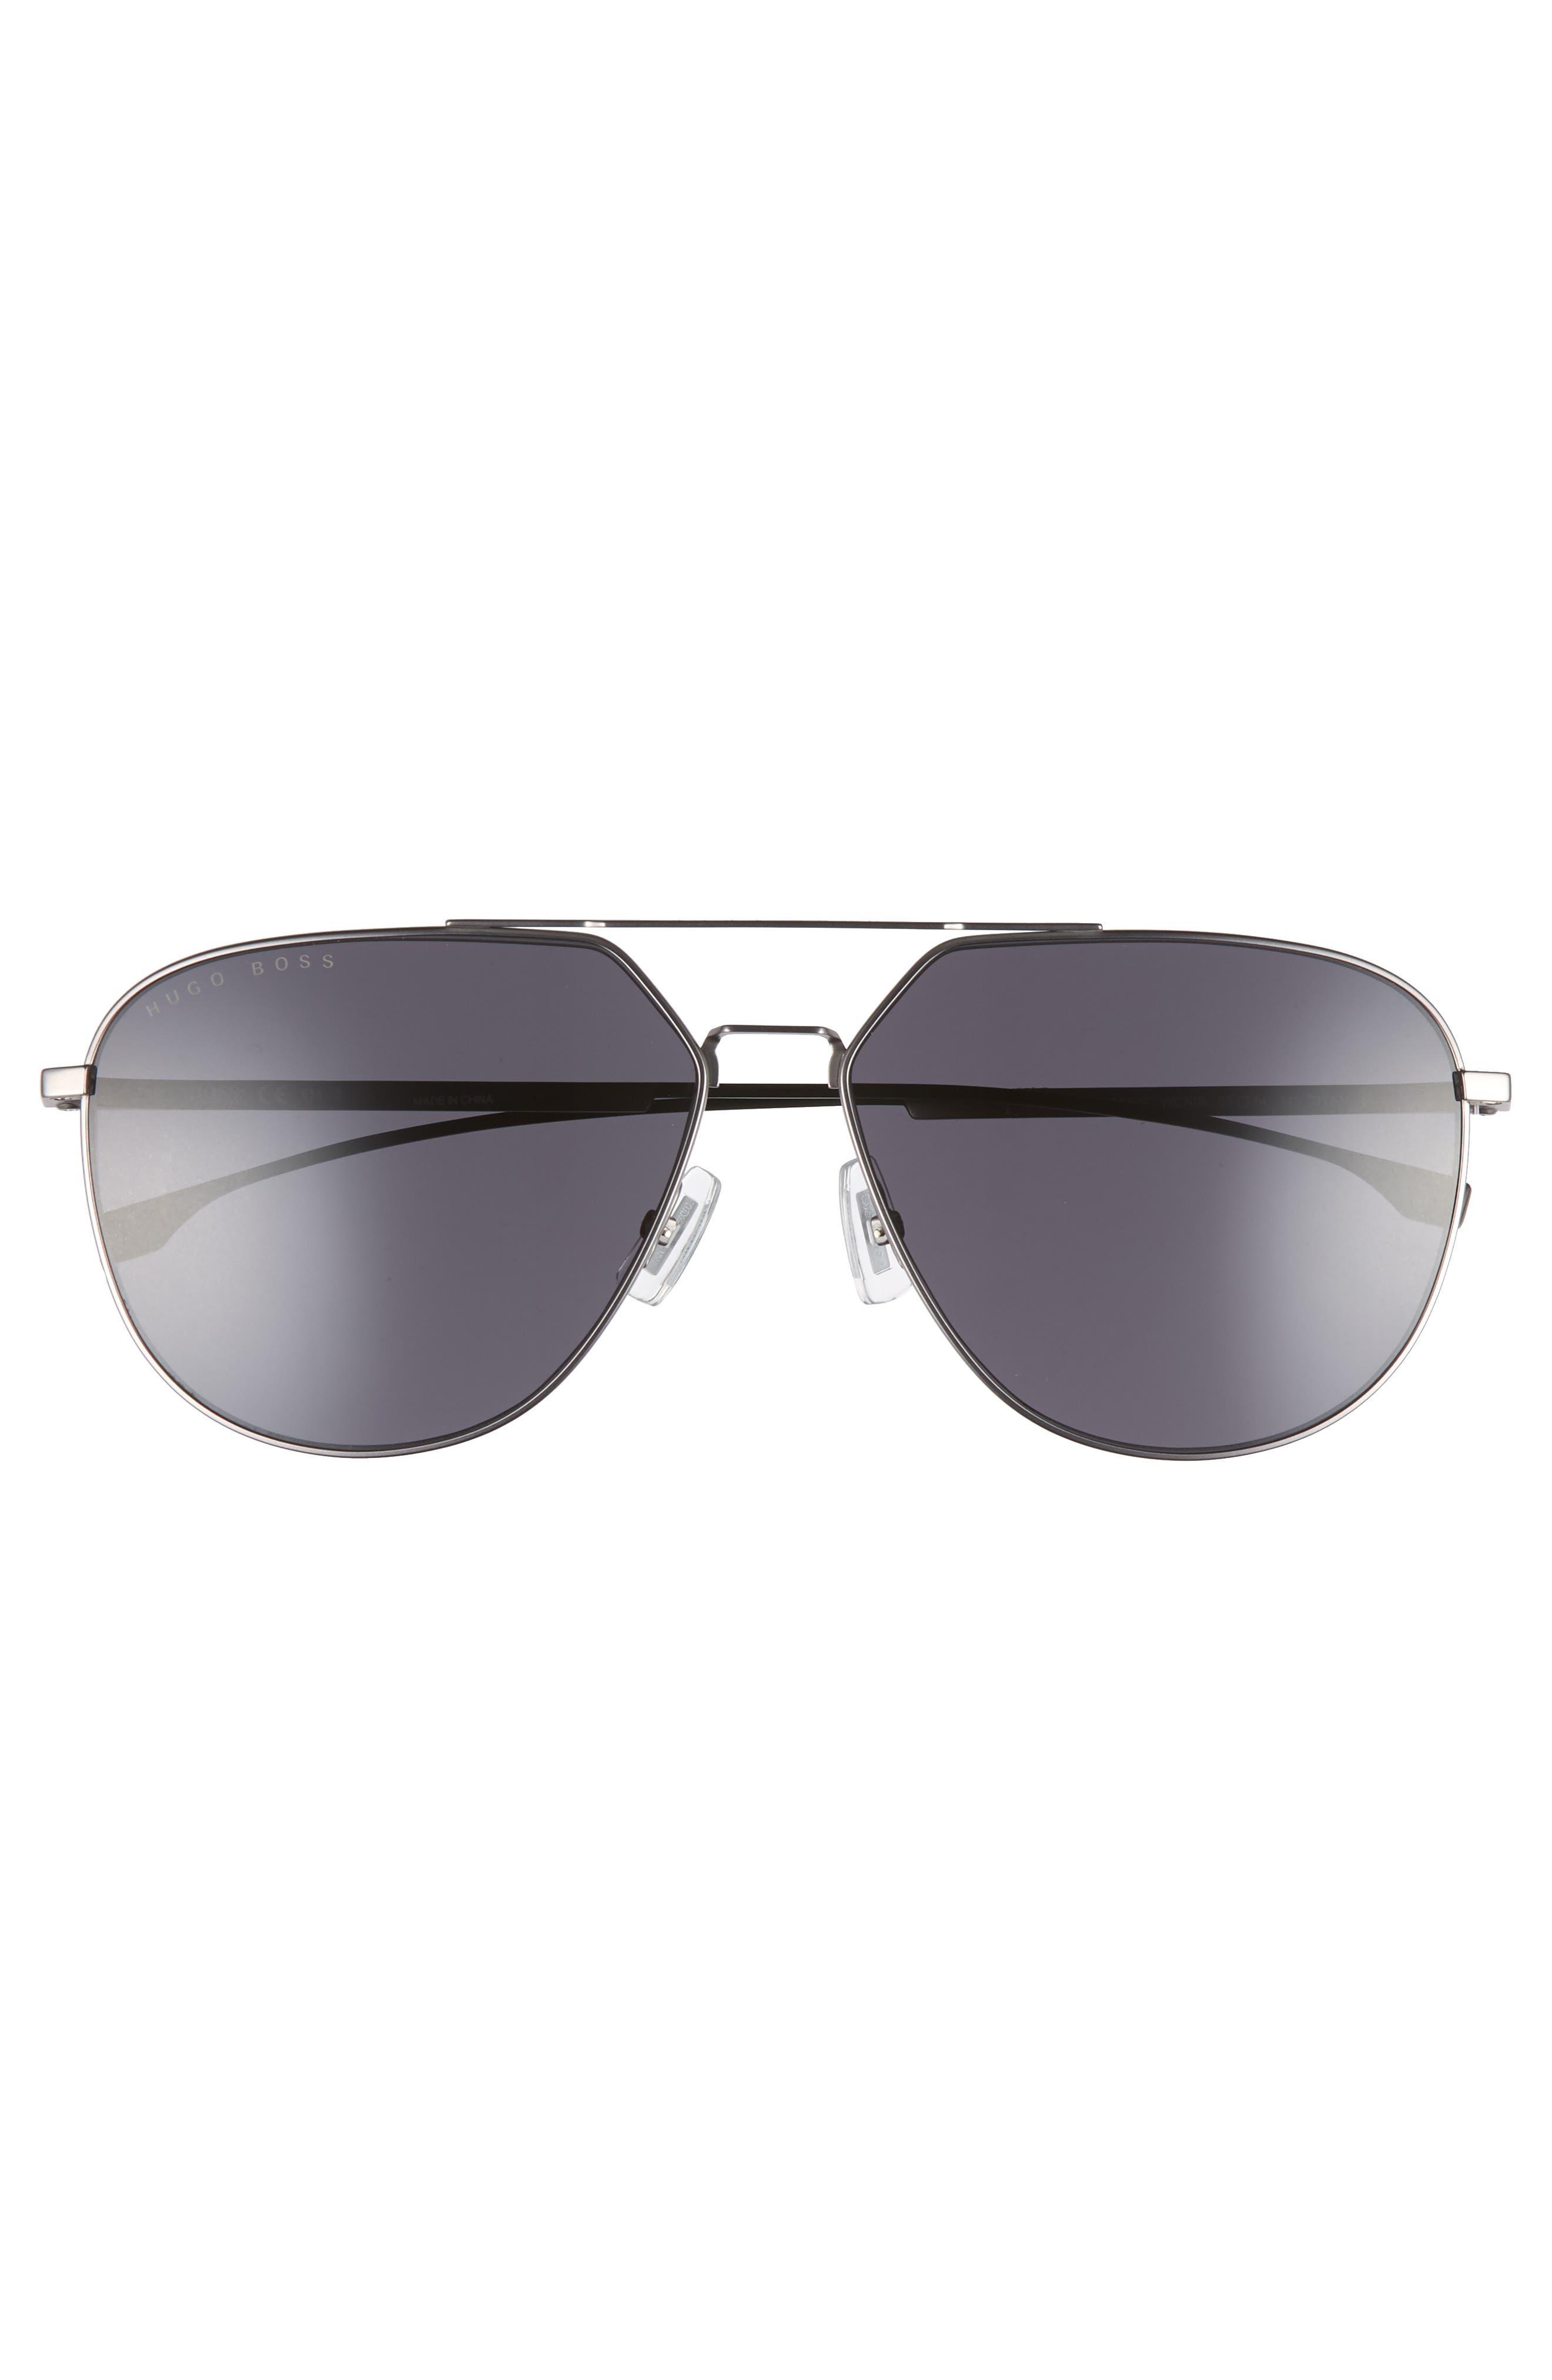 63mm Polarized Aviator Sunglasses,                             Alternate thumbnail 2, color,                             Matte Grey